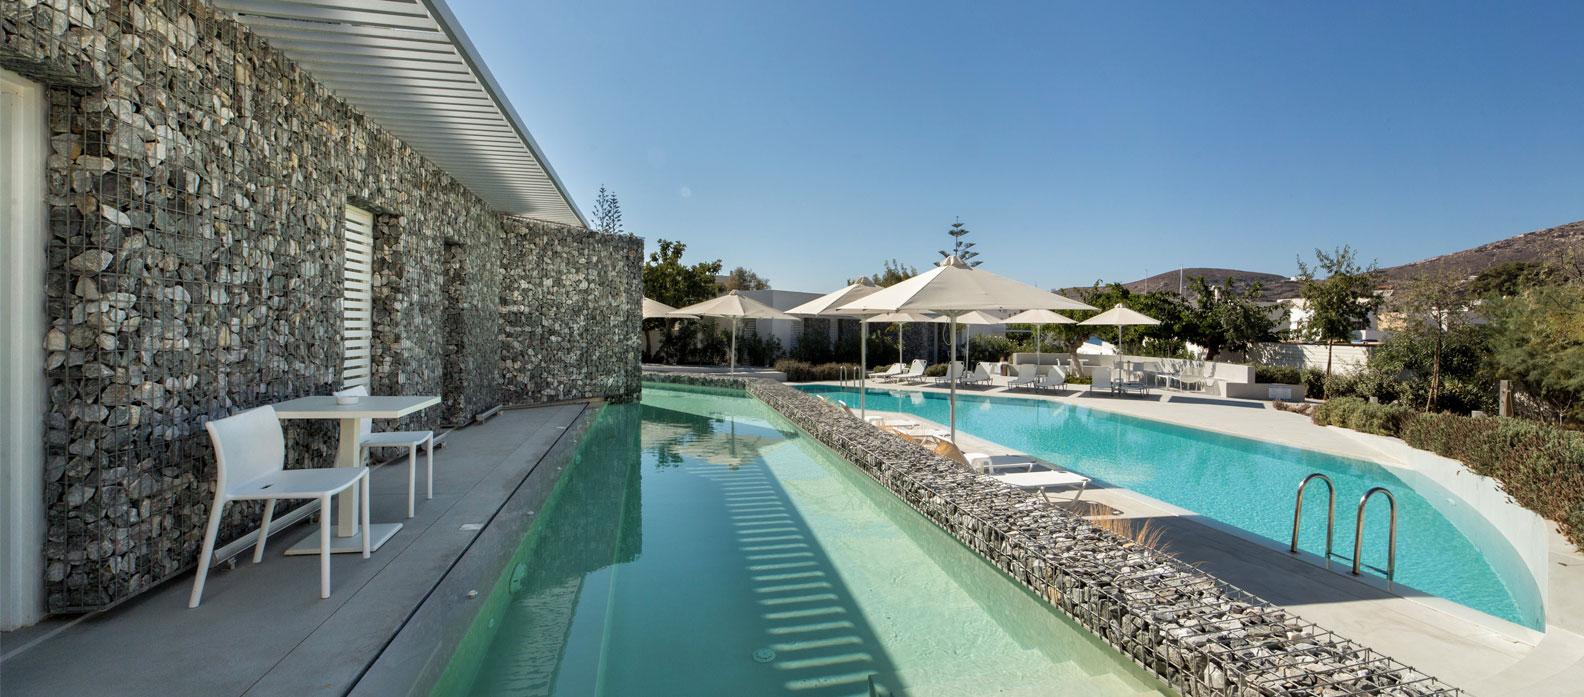 luxury ios hotels